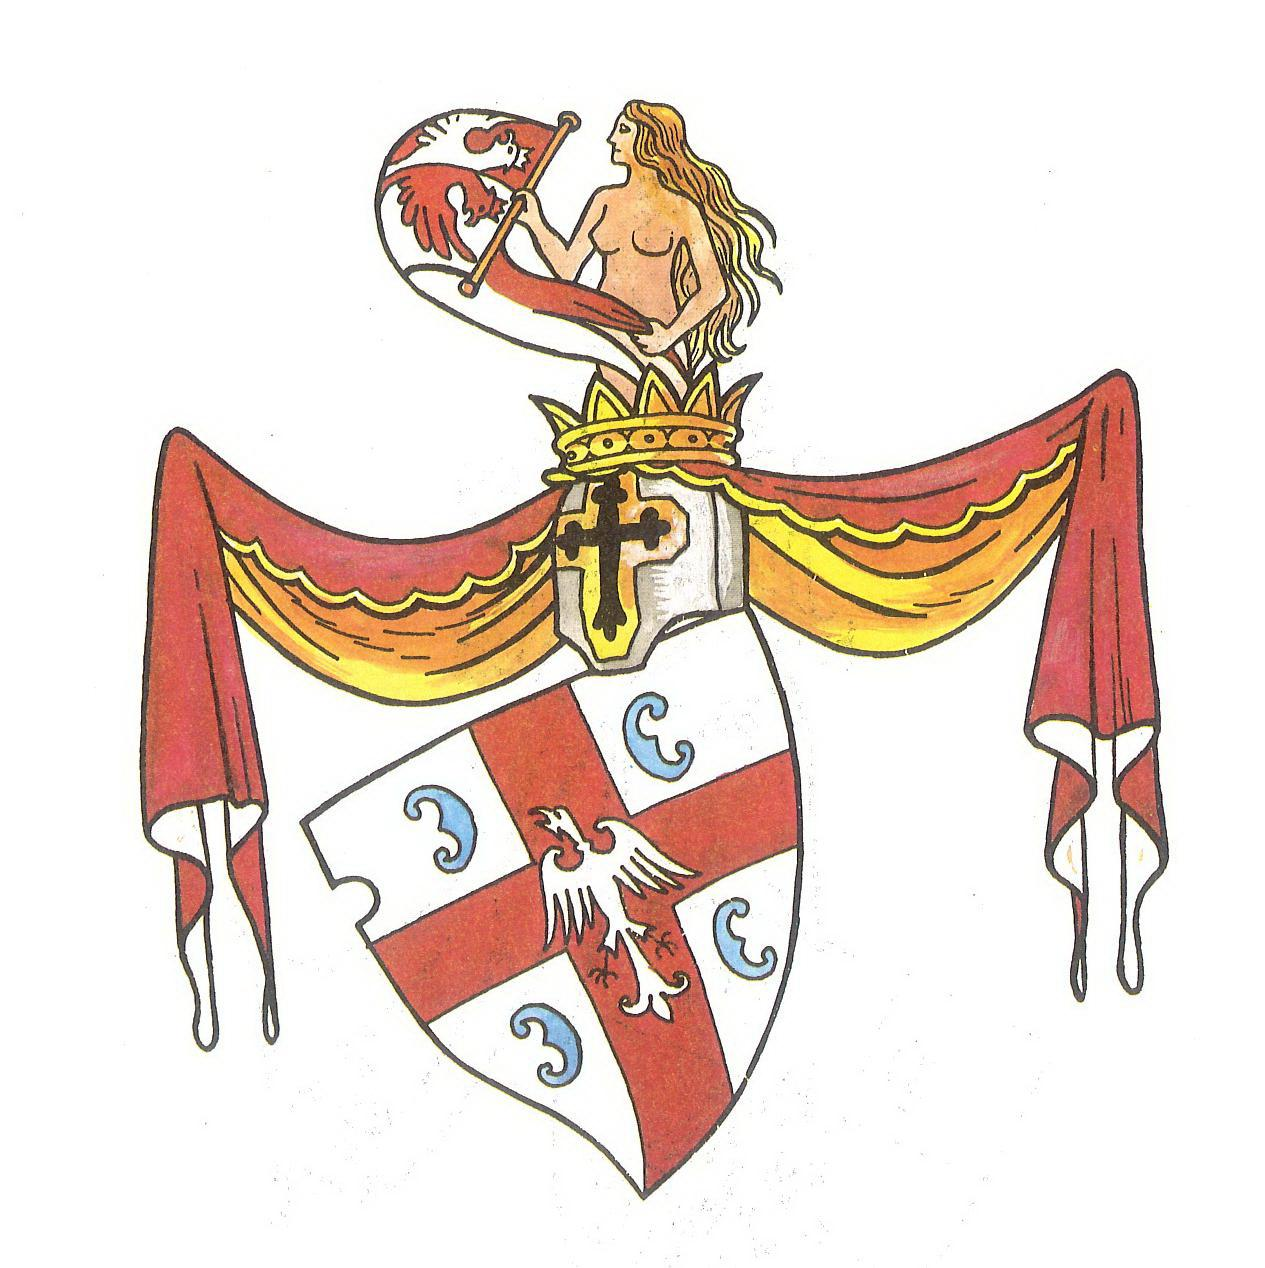 grb-mrnjavcevic-korenic-neoric.jpg